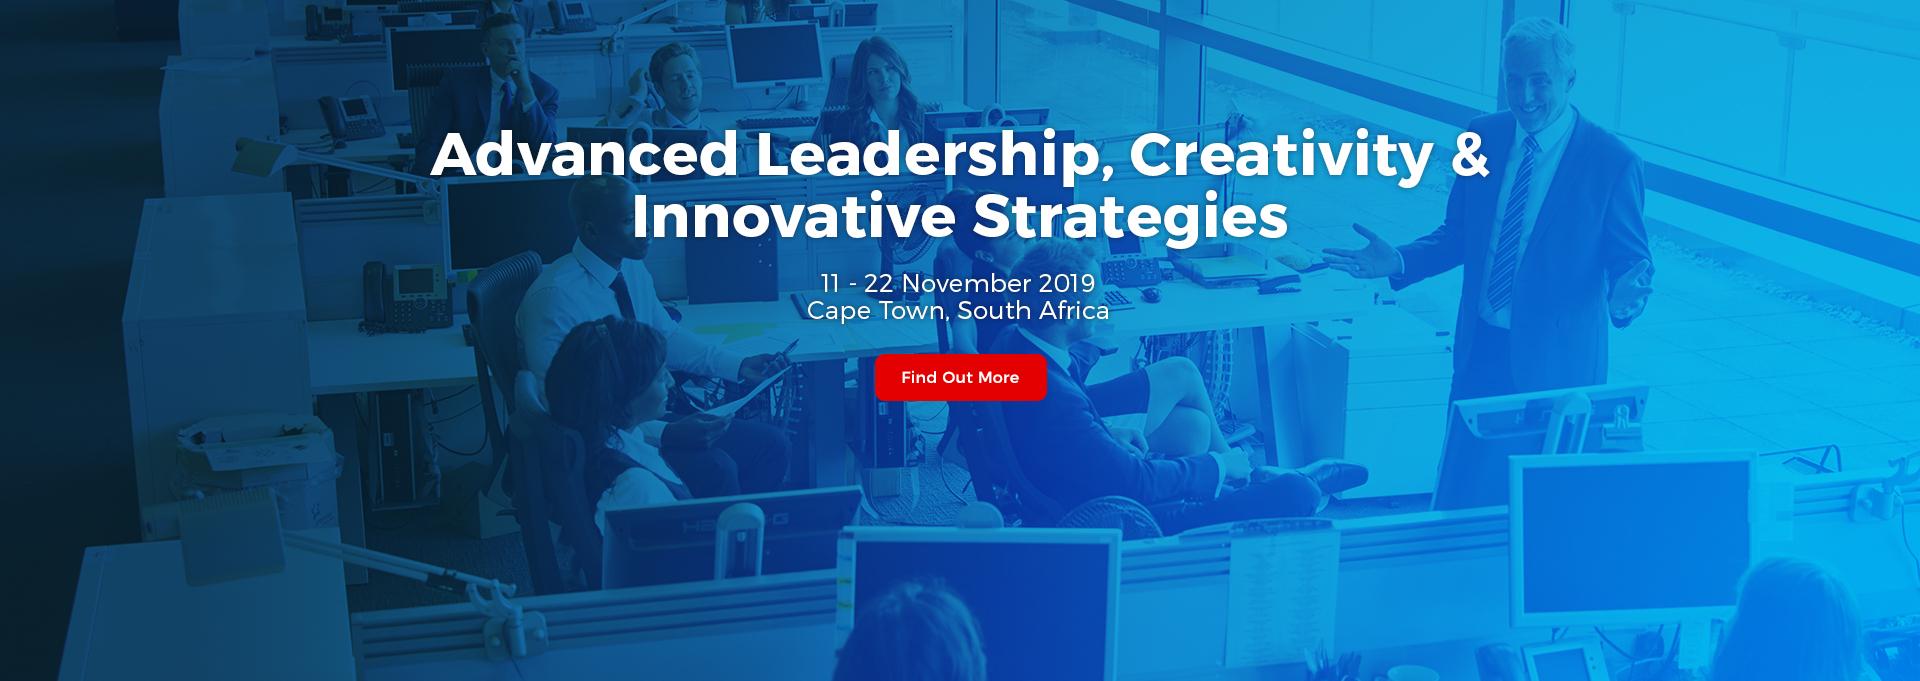 EuroMaTech Advanced Leadership, Creativity & Innovative Strategies